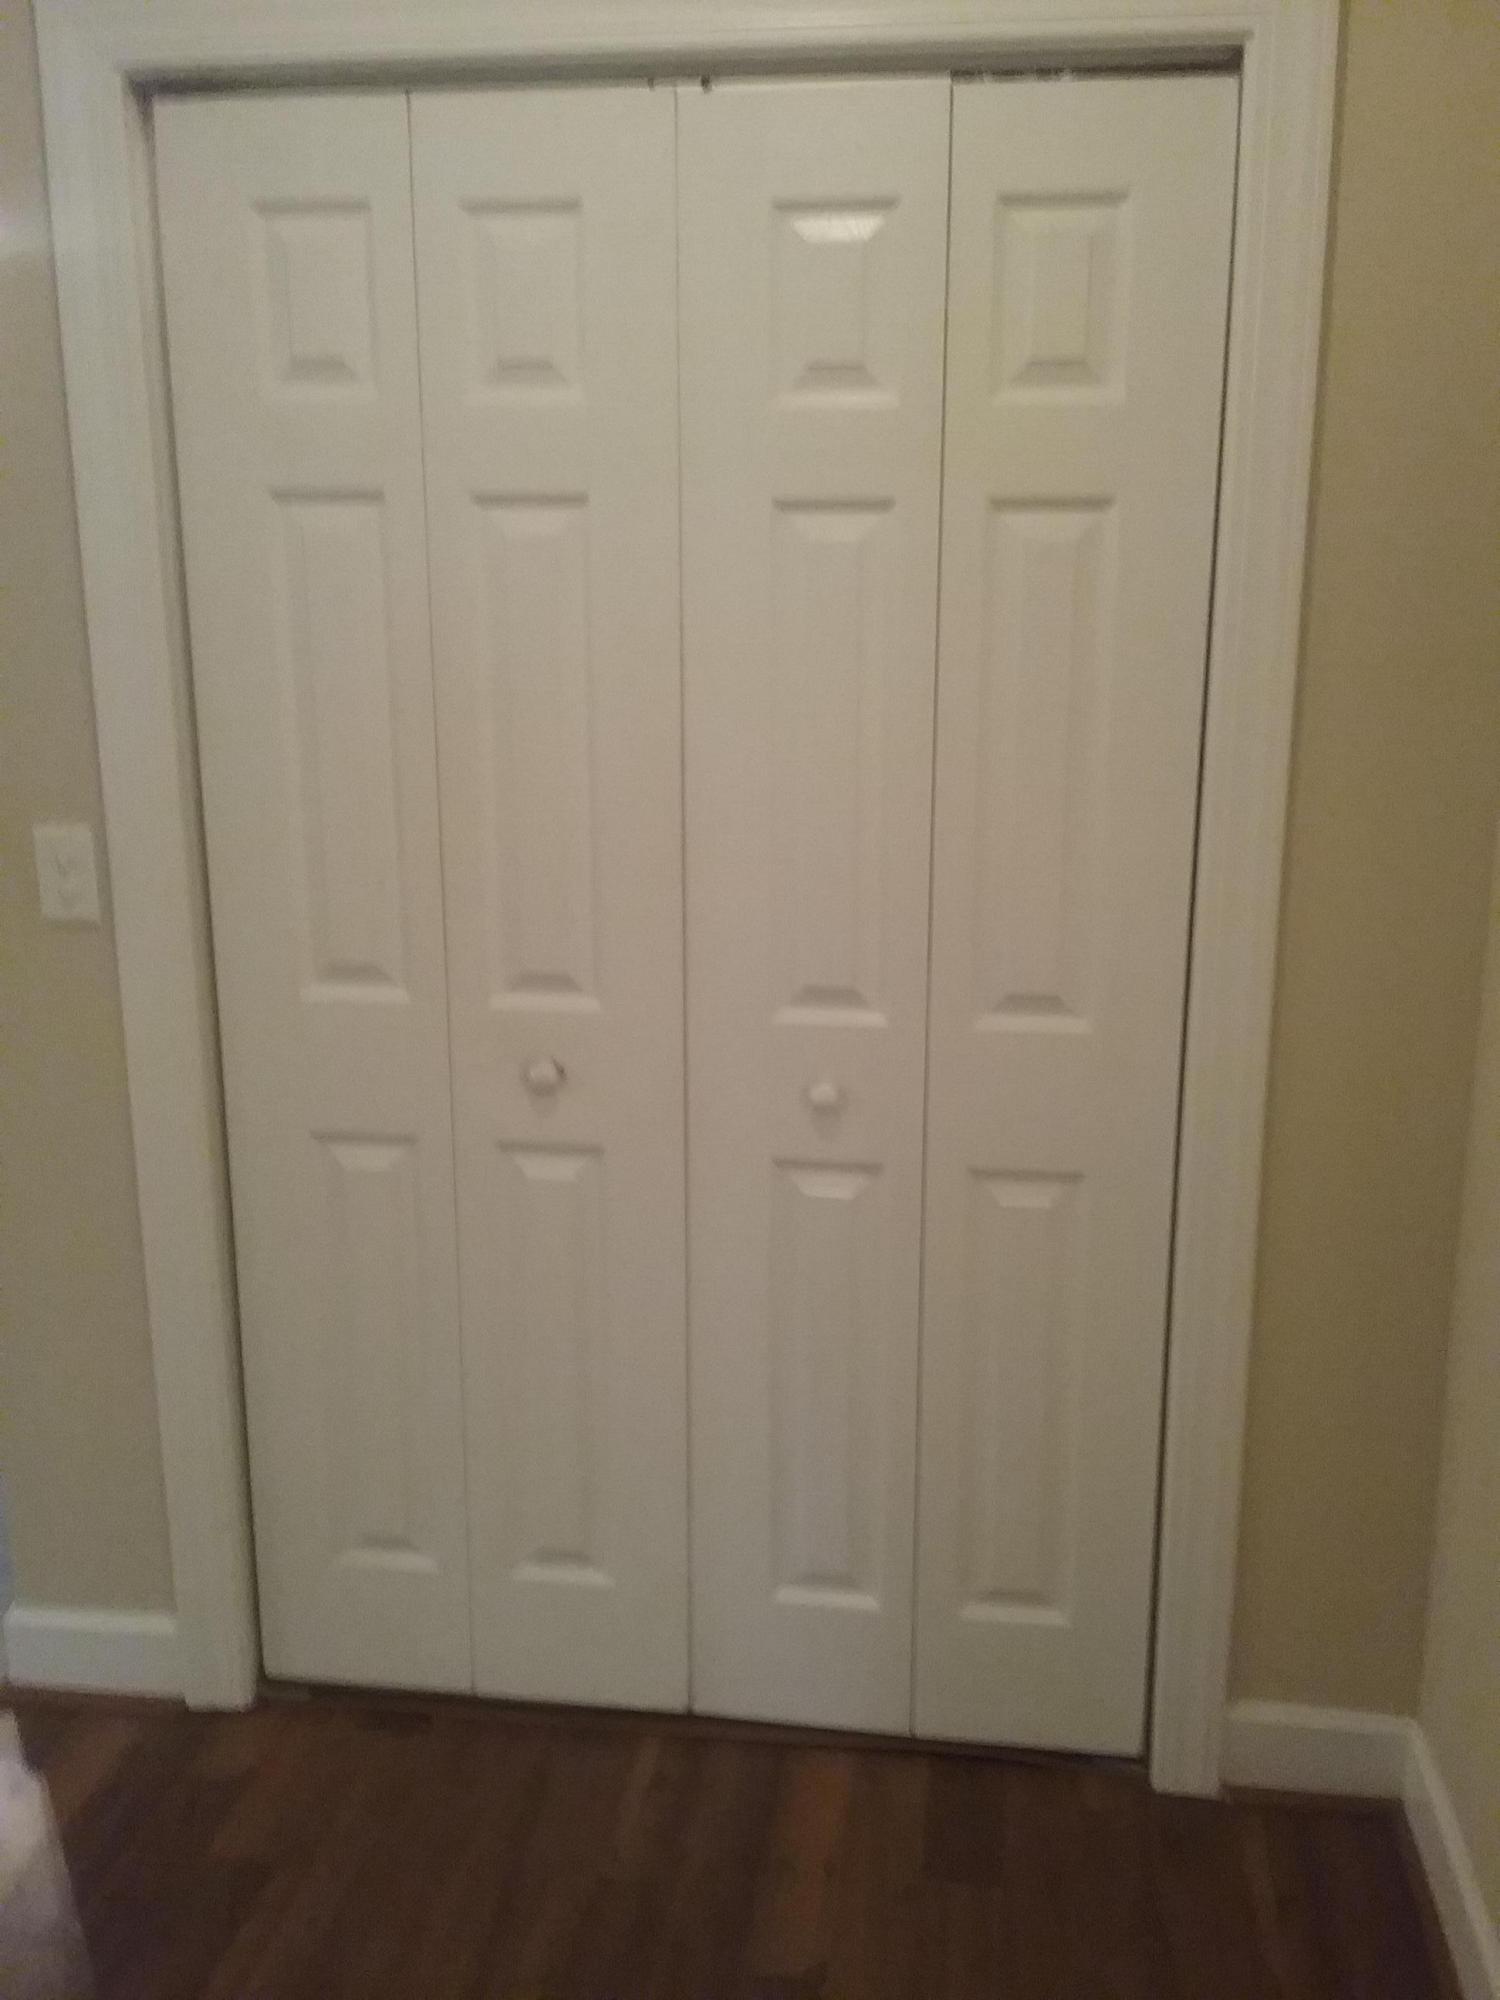 Ballards Pointe II Homes For Sale - 103 Ballard, Santee, SC - 20